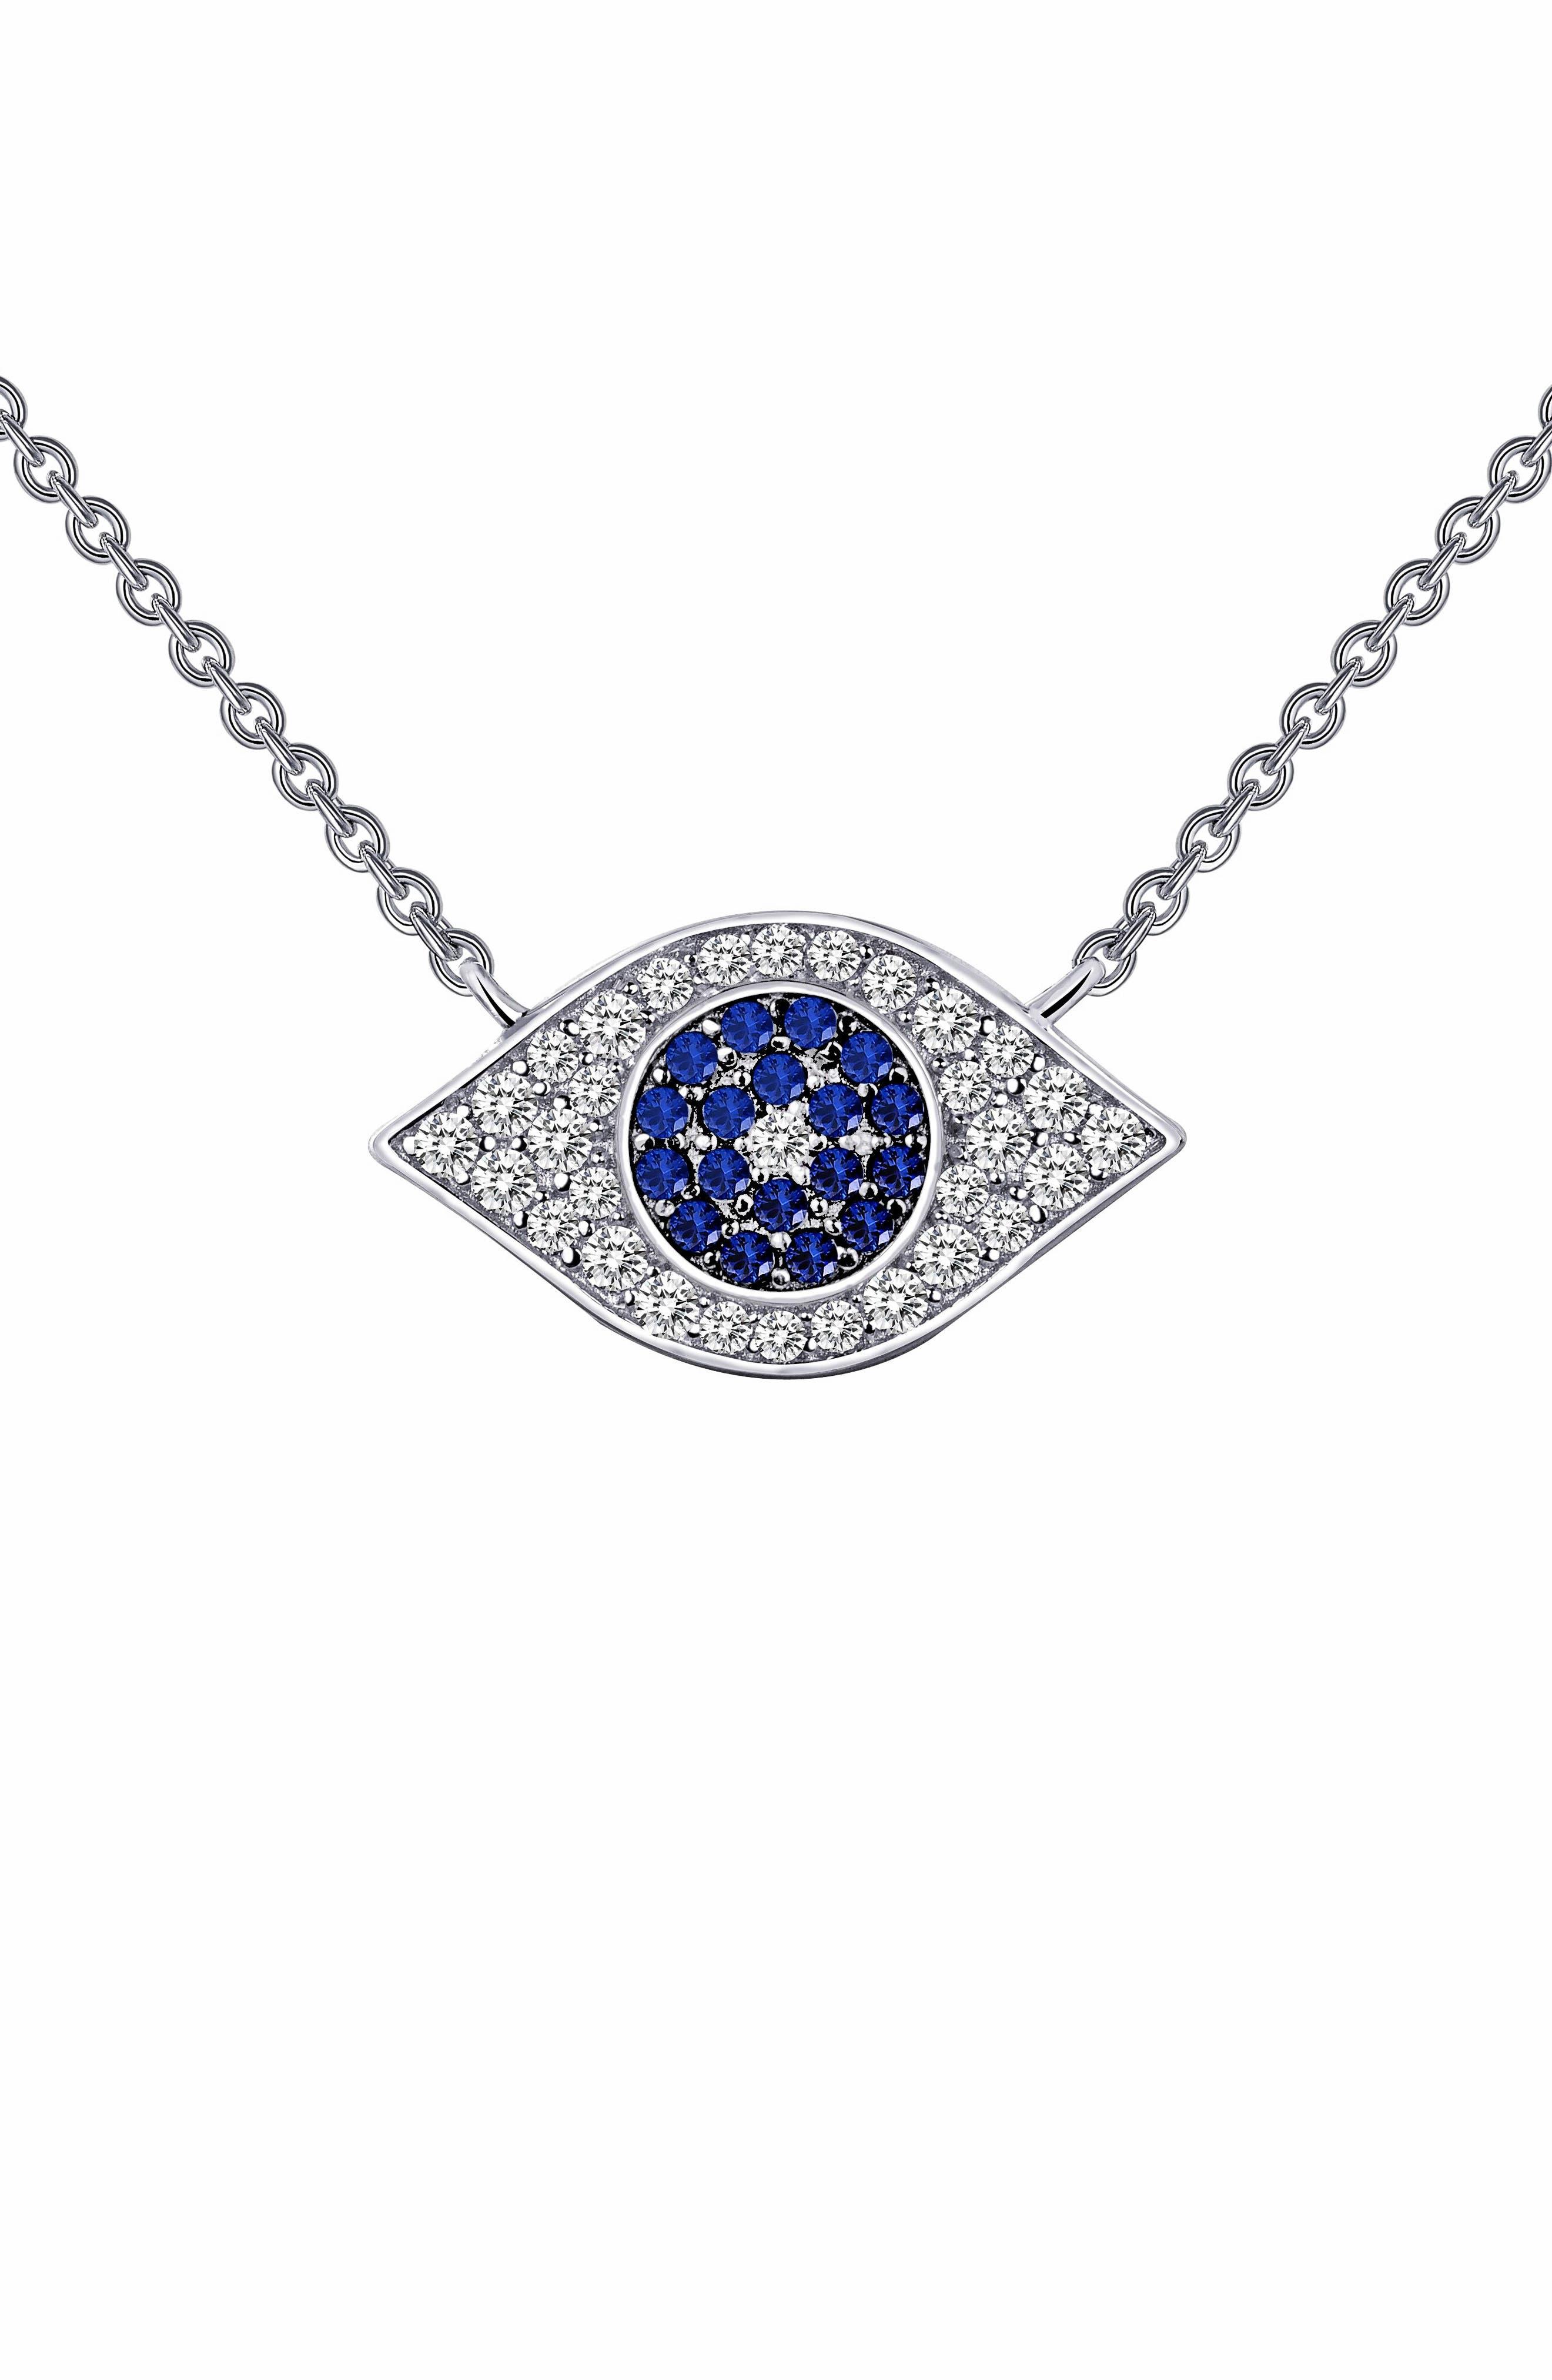 Main Image - Lafonn Simulated Diamond Amulet Pendant Necklace